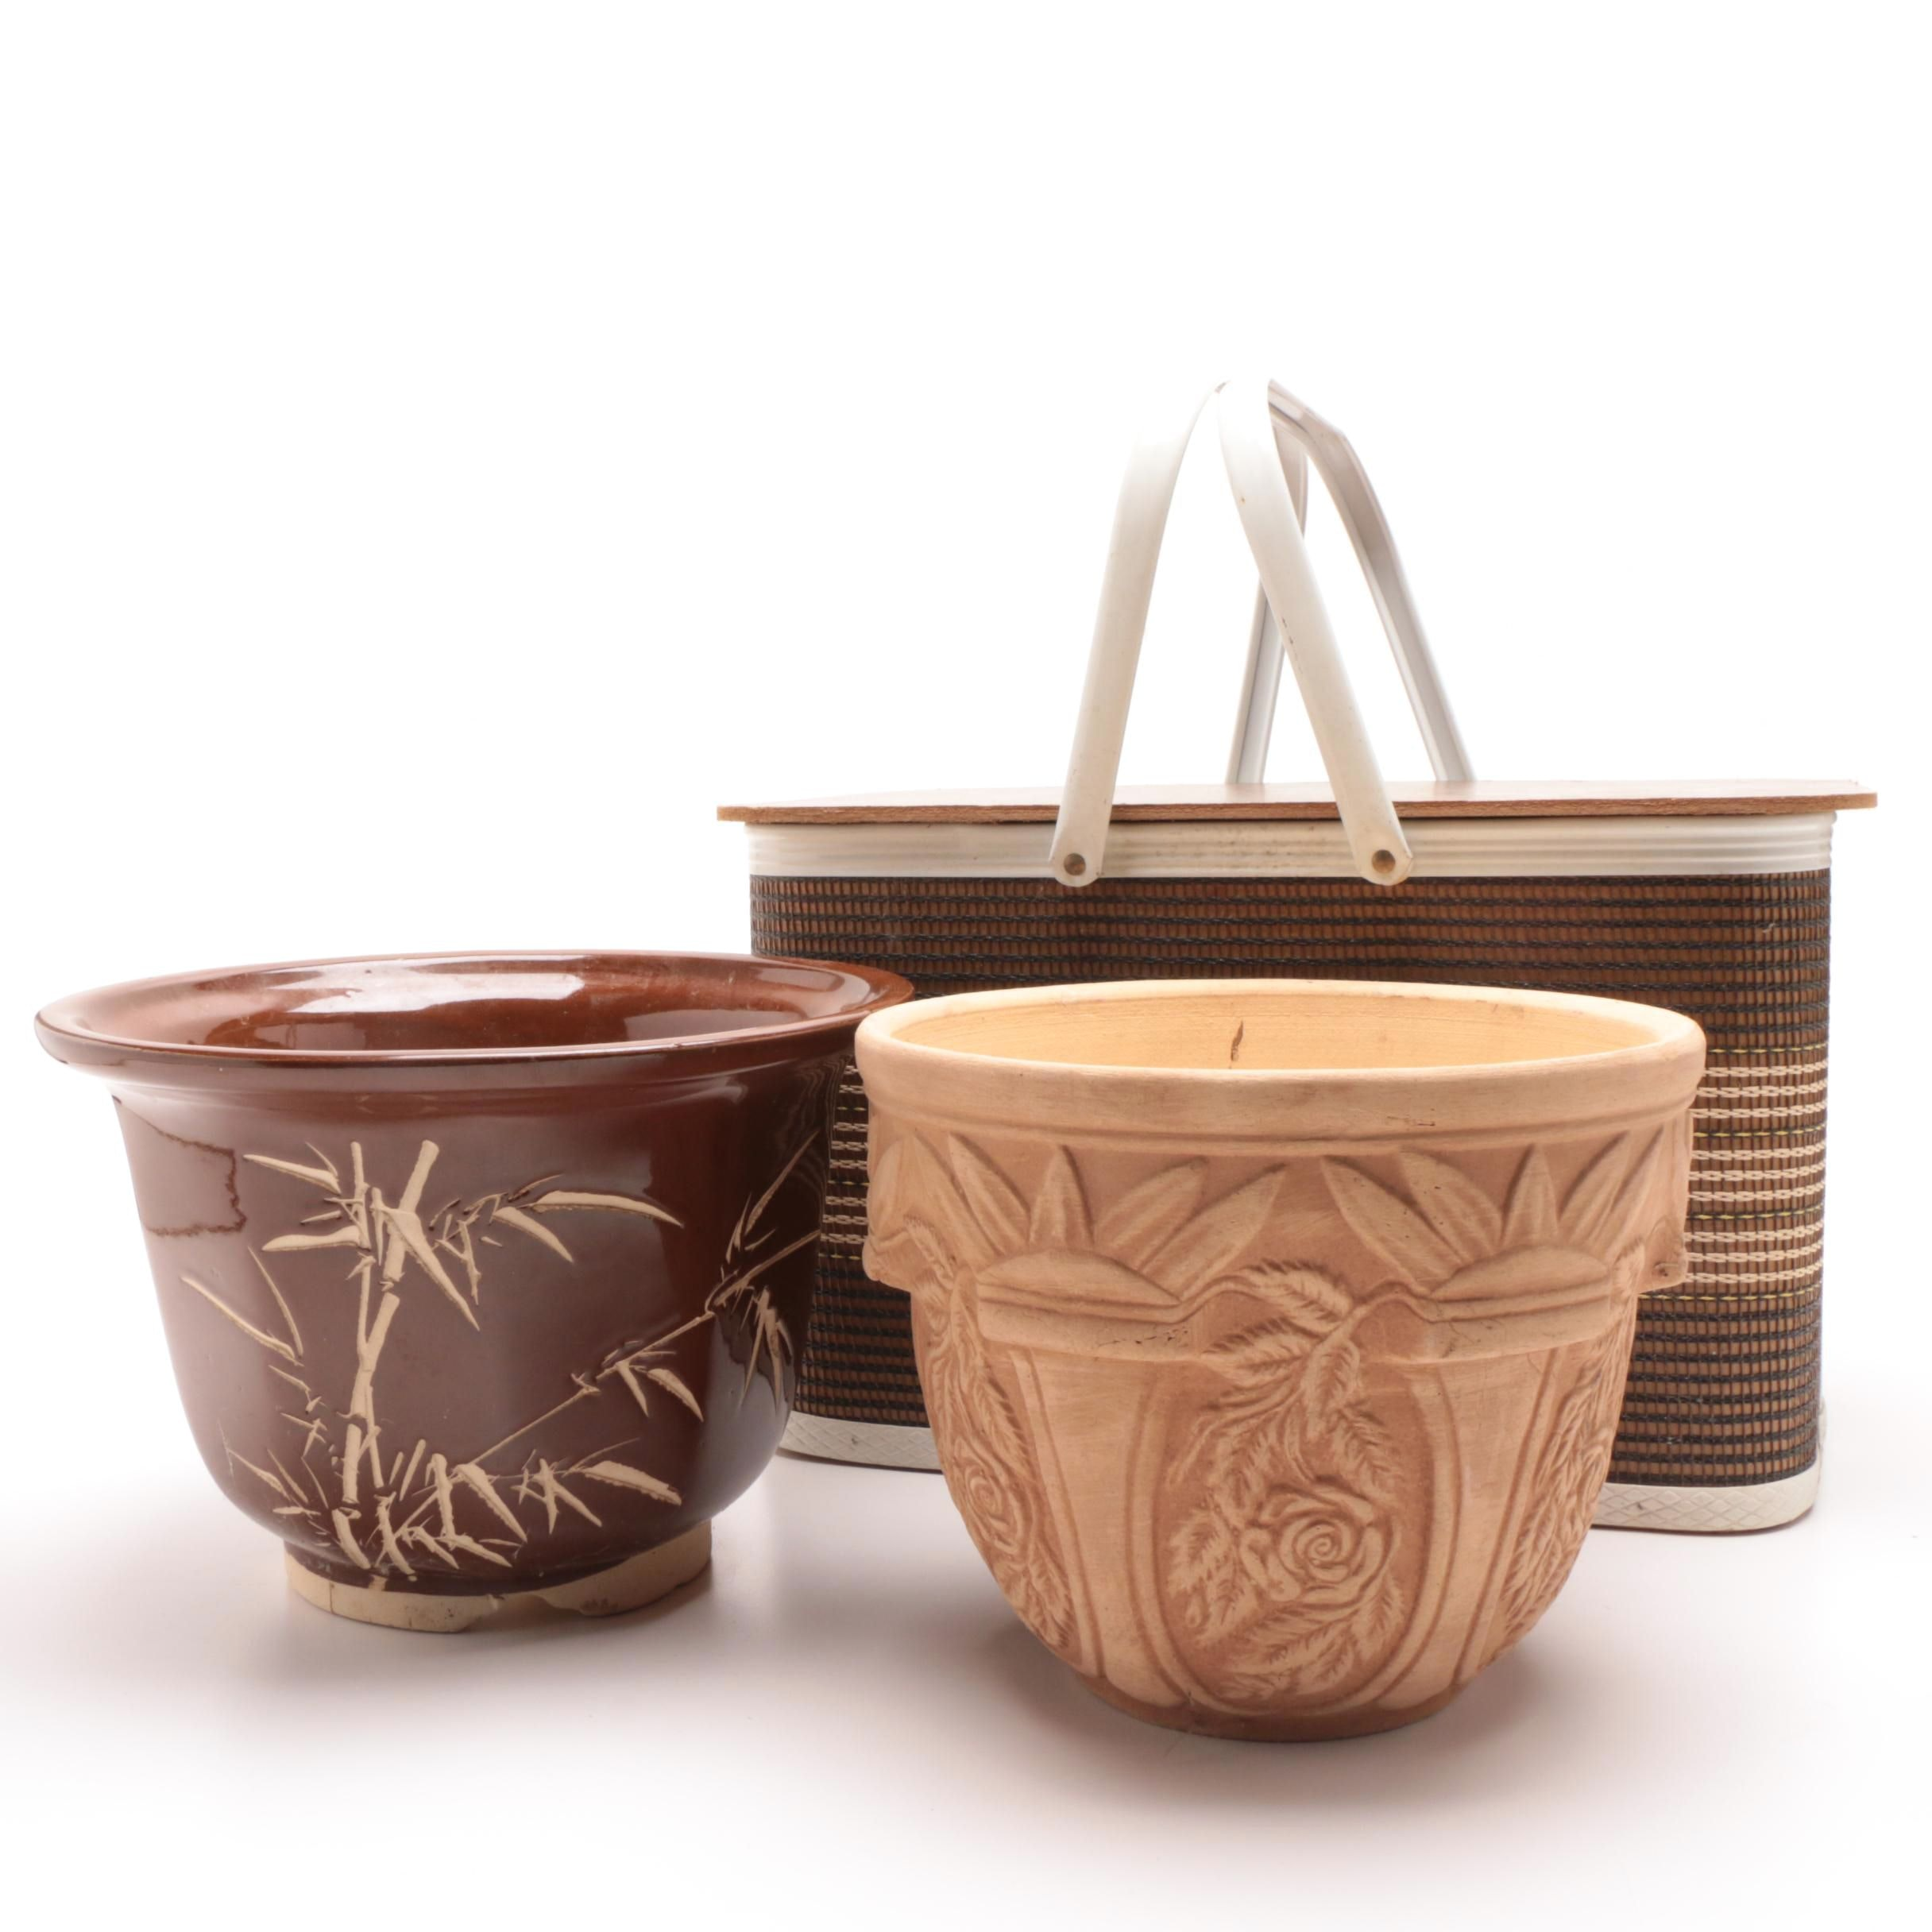 Ceramic Planters and Picnic Basket